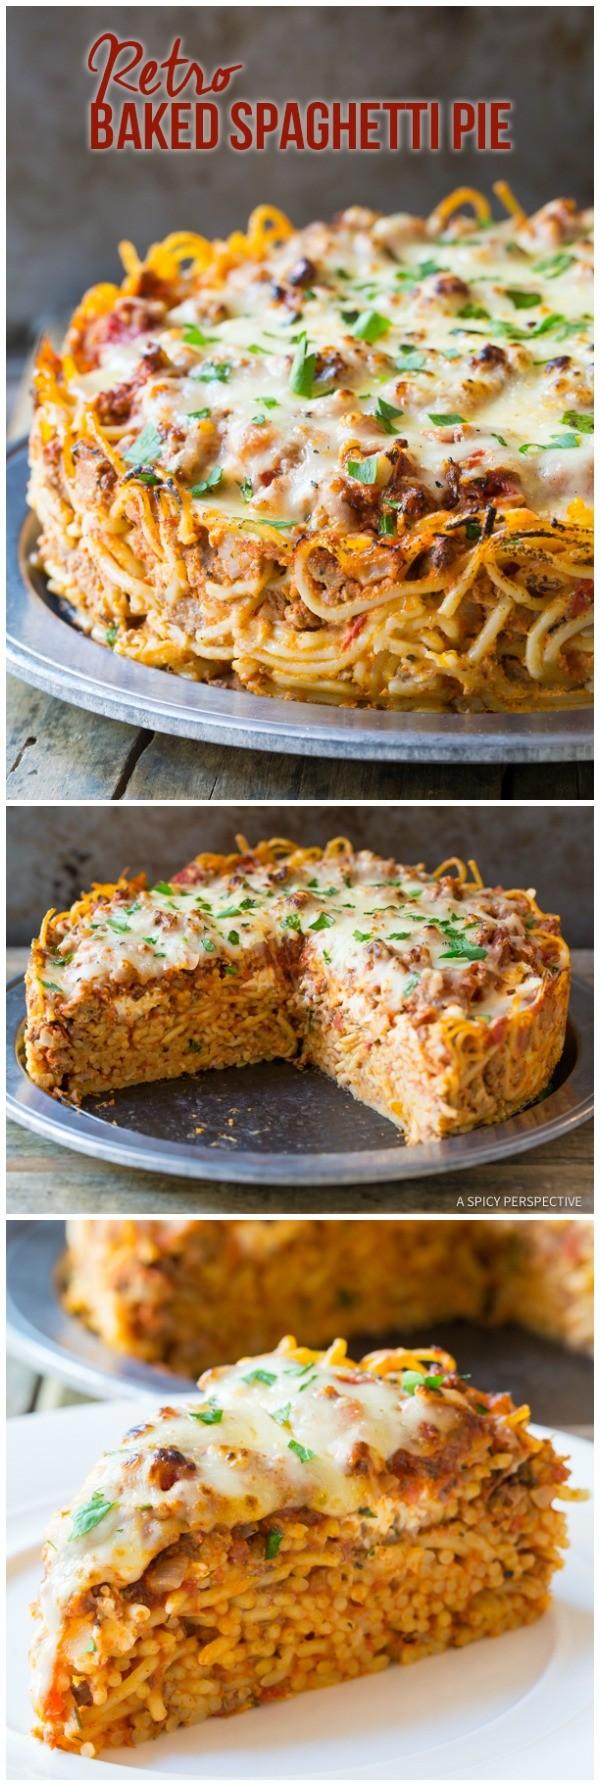 Get the recipe Retro Baked Spaghetti Pie @recipes_to_go